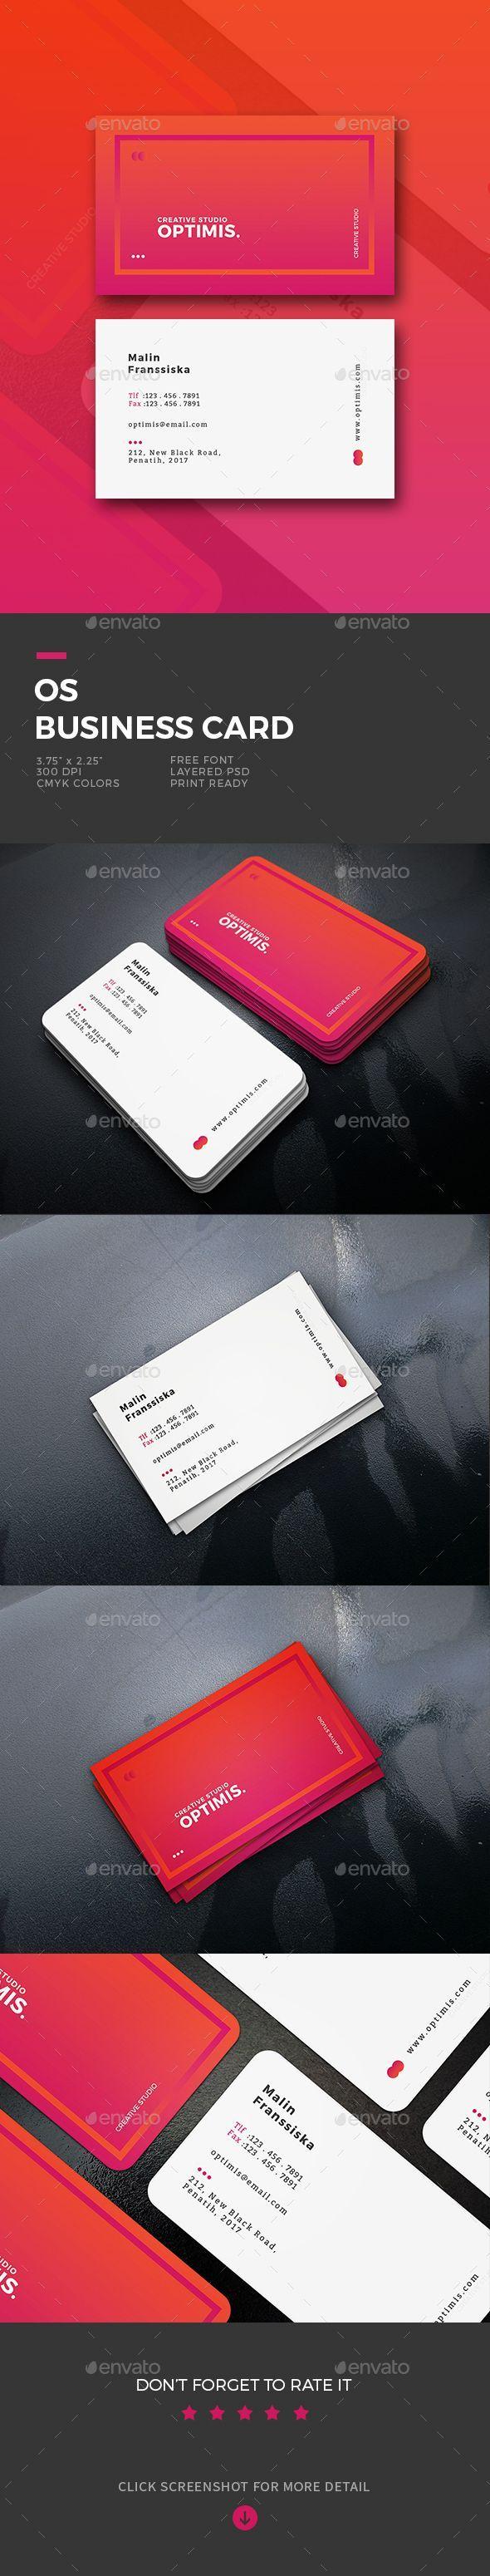 OS Business Card